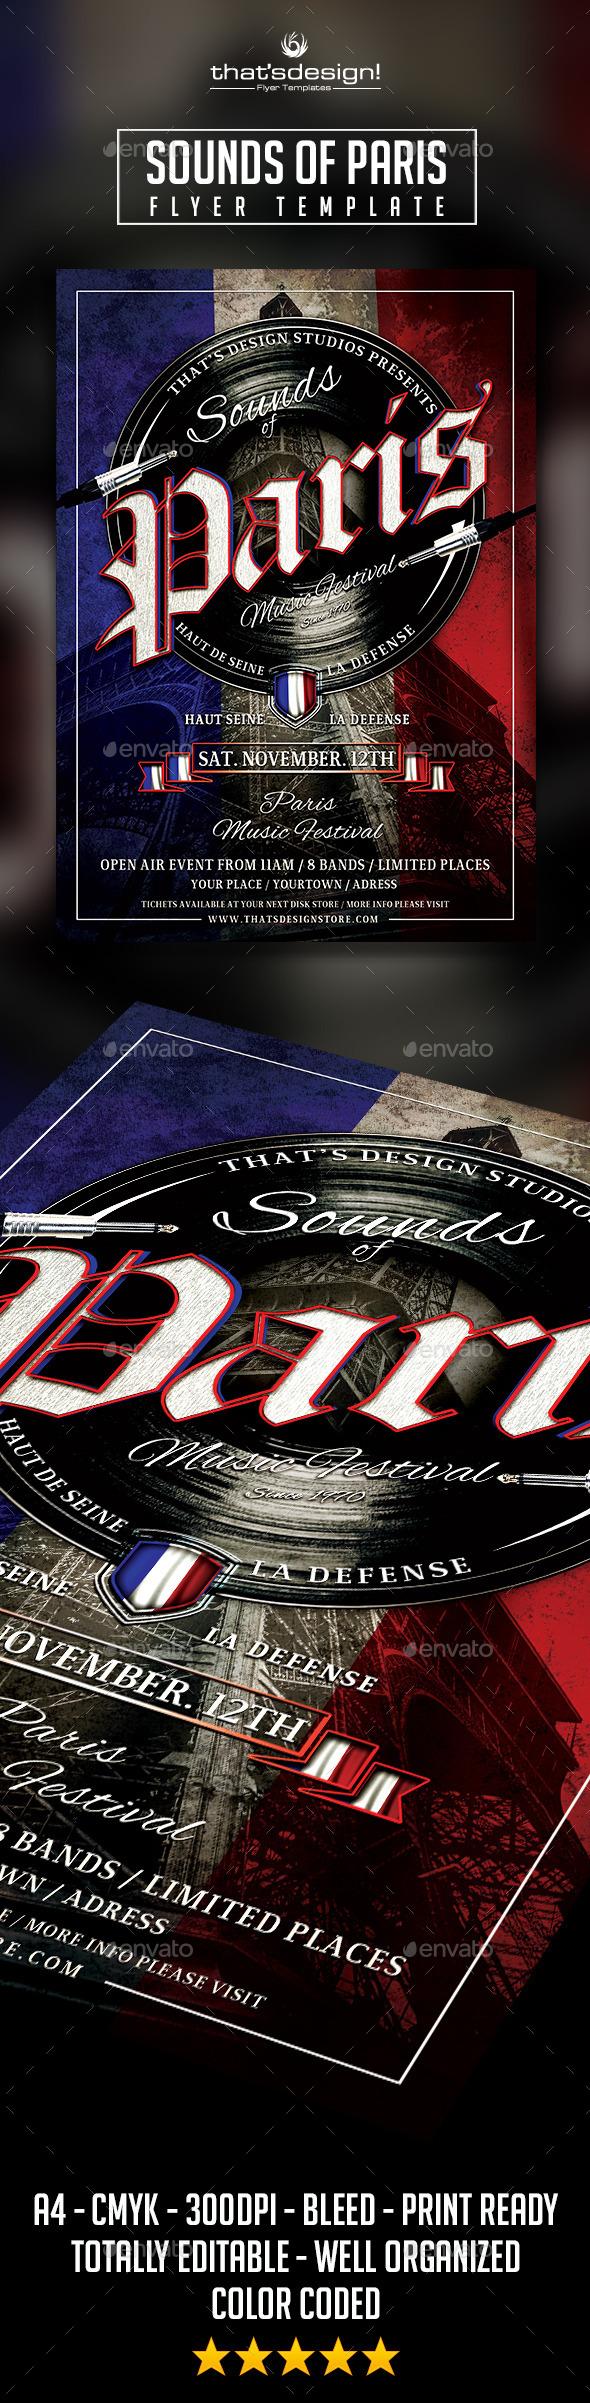 GraphicRiver Sounds of Paris Flyer Template 10681535